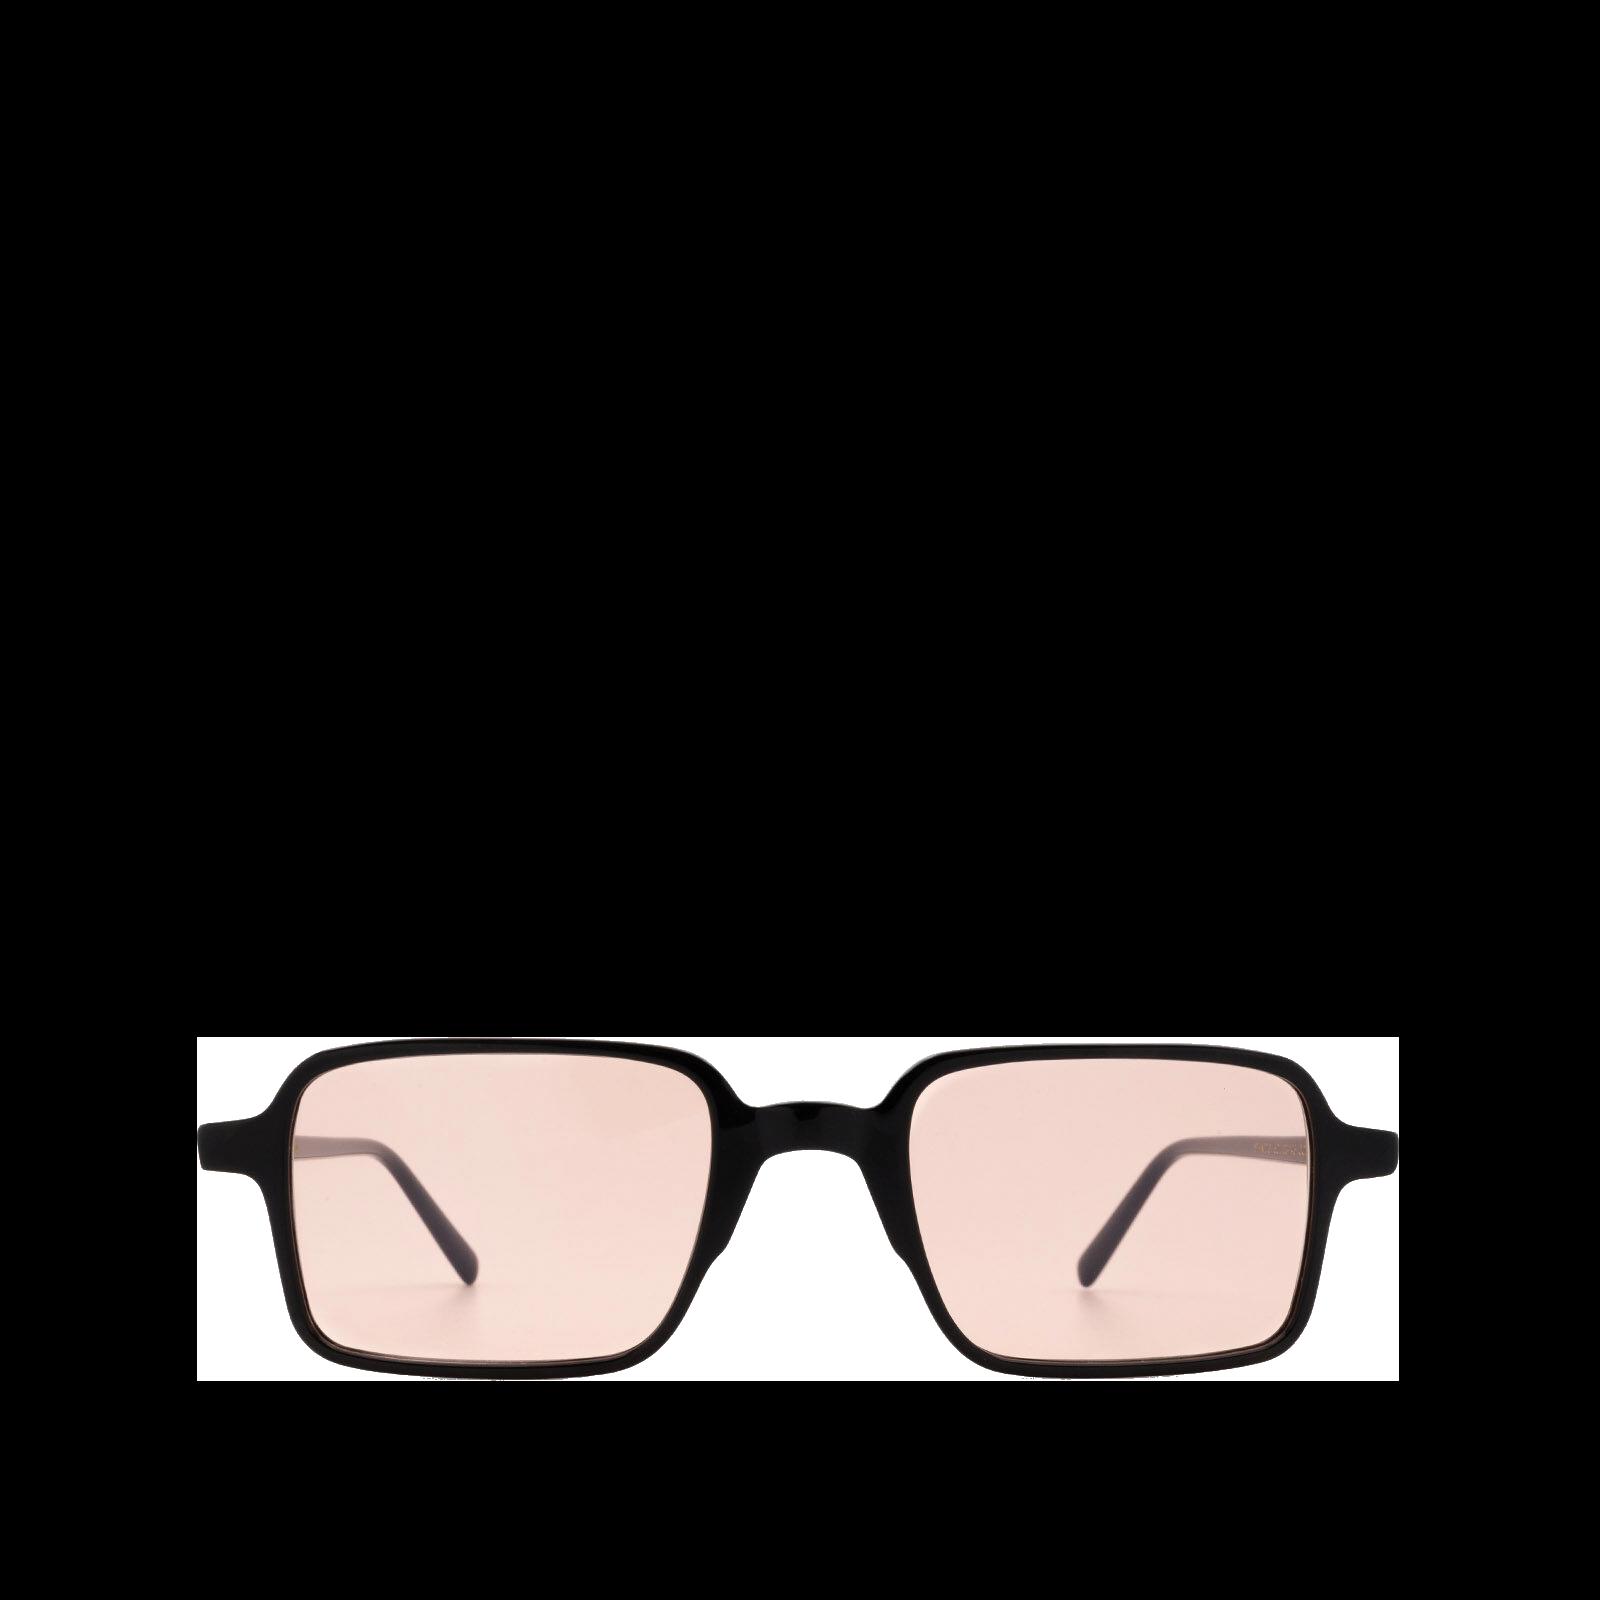 Sunglasses Guide 2021 - Moscot